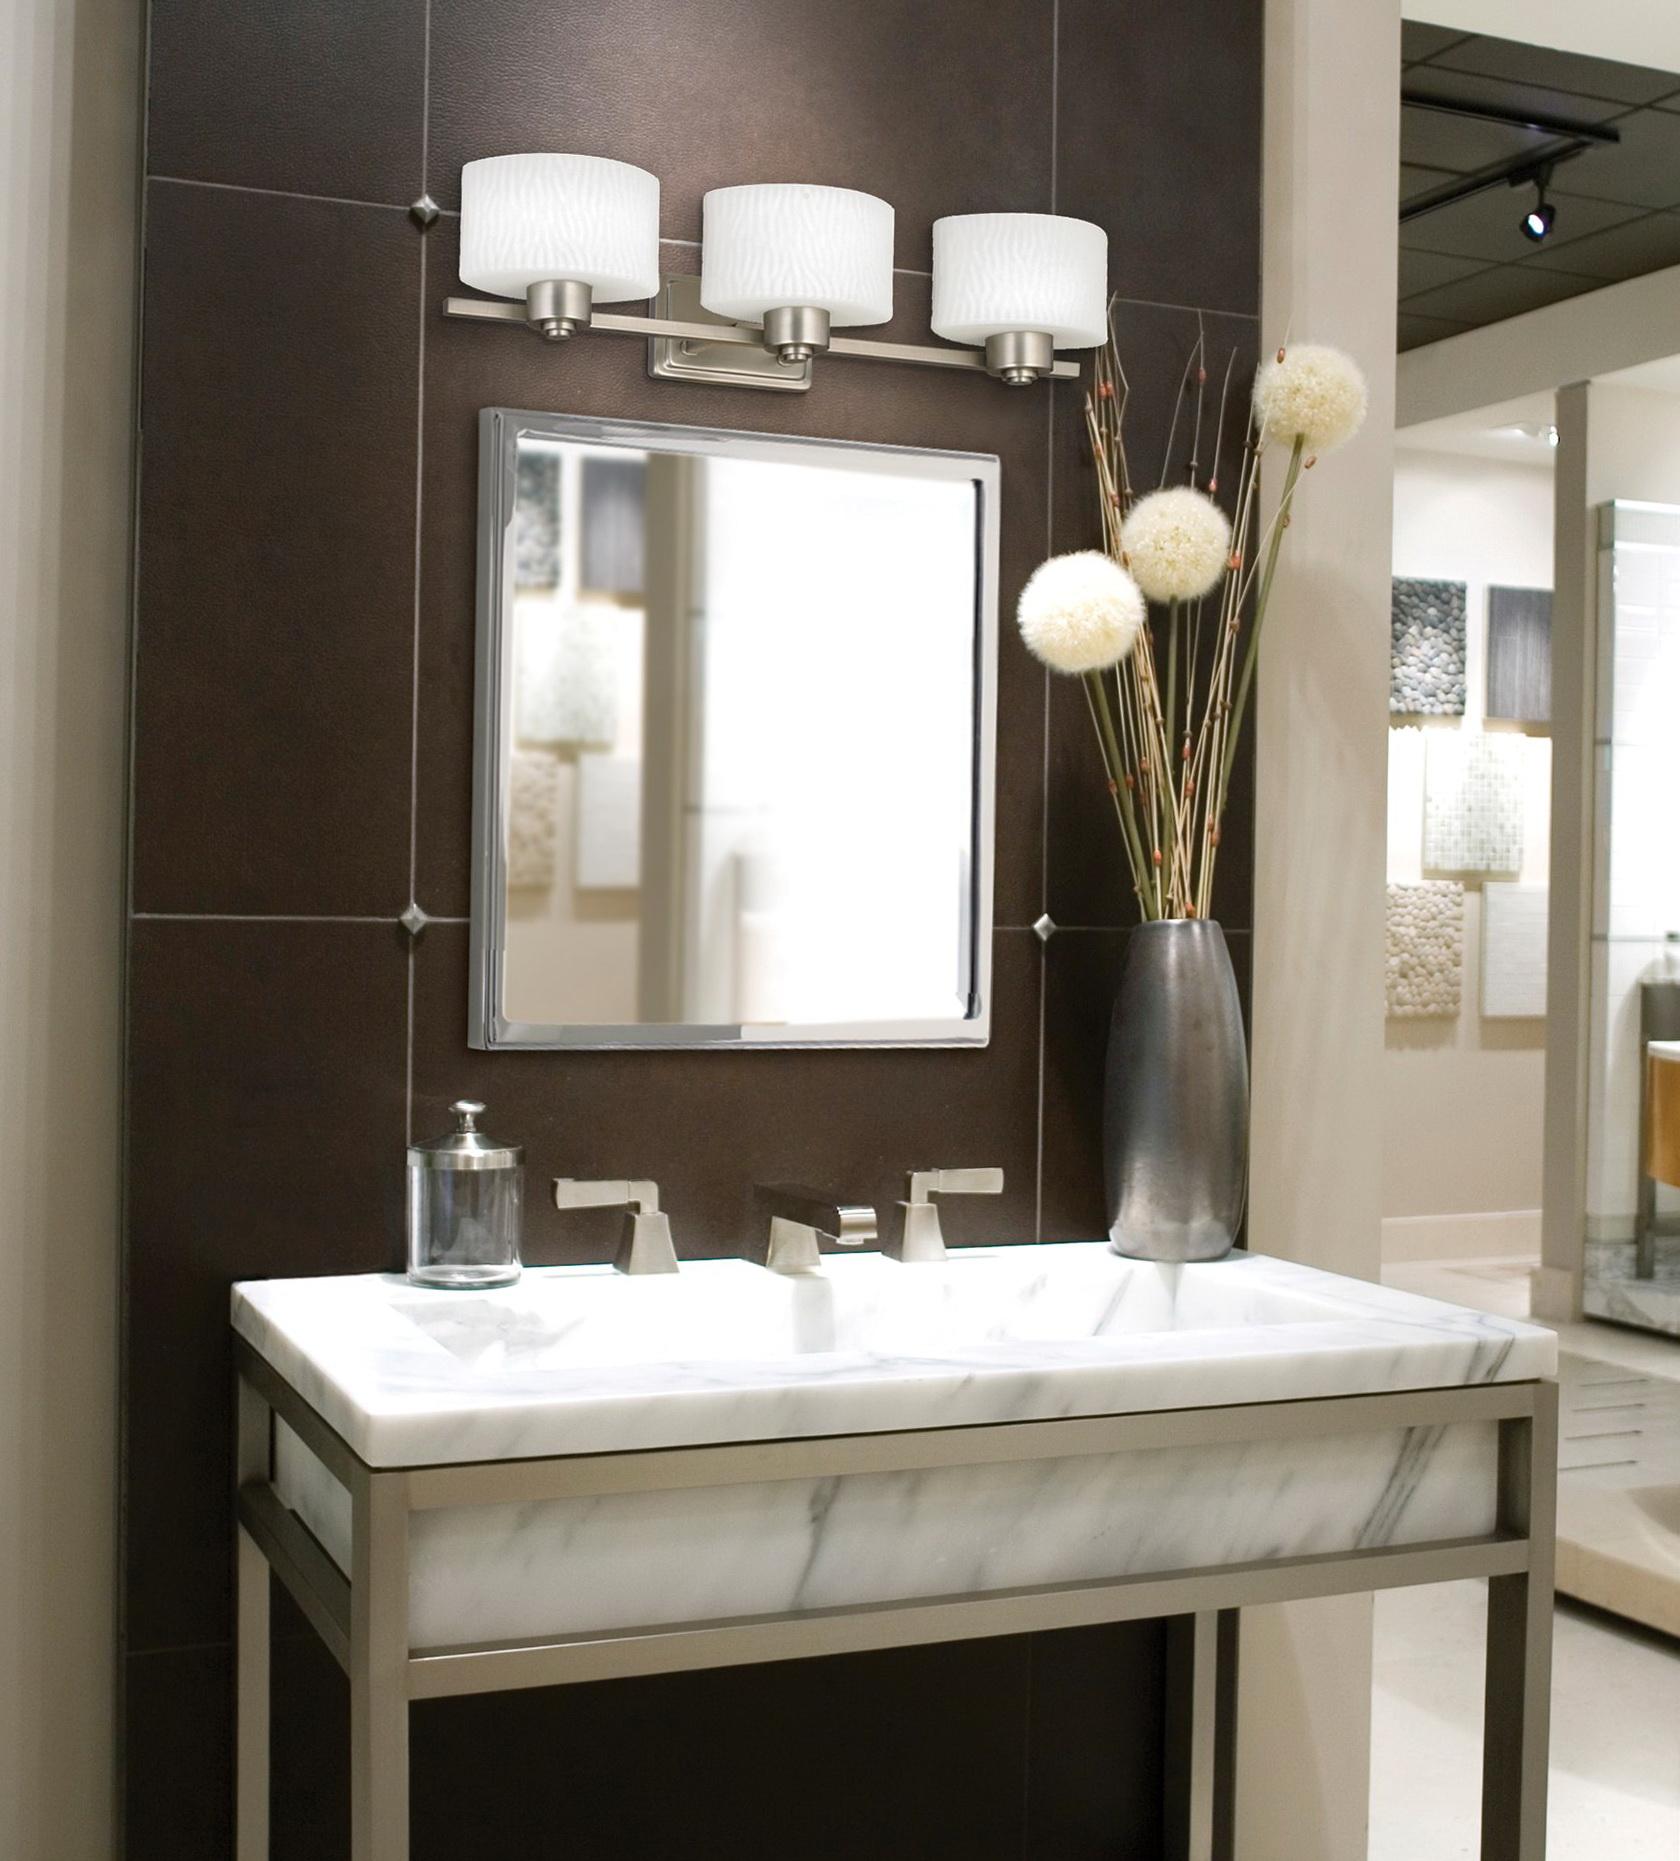 bathroom vanity mirrors with lights bathroom vanity wondrous bathroom vanity mirrors for com ideas brushed  nickel BZJZQFA